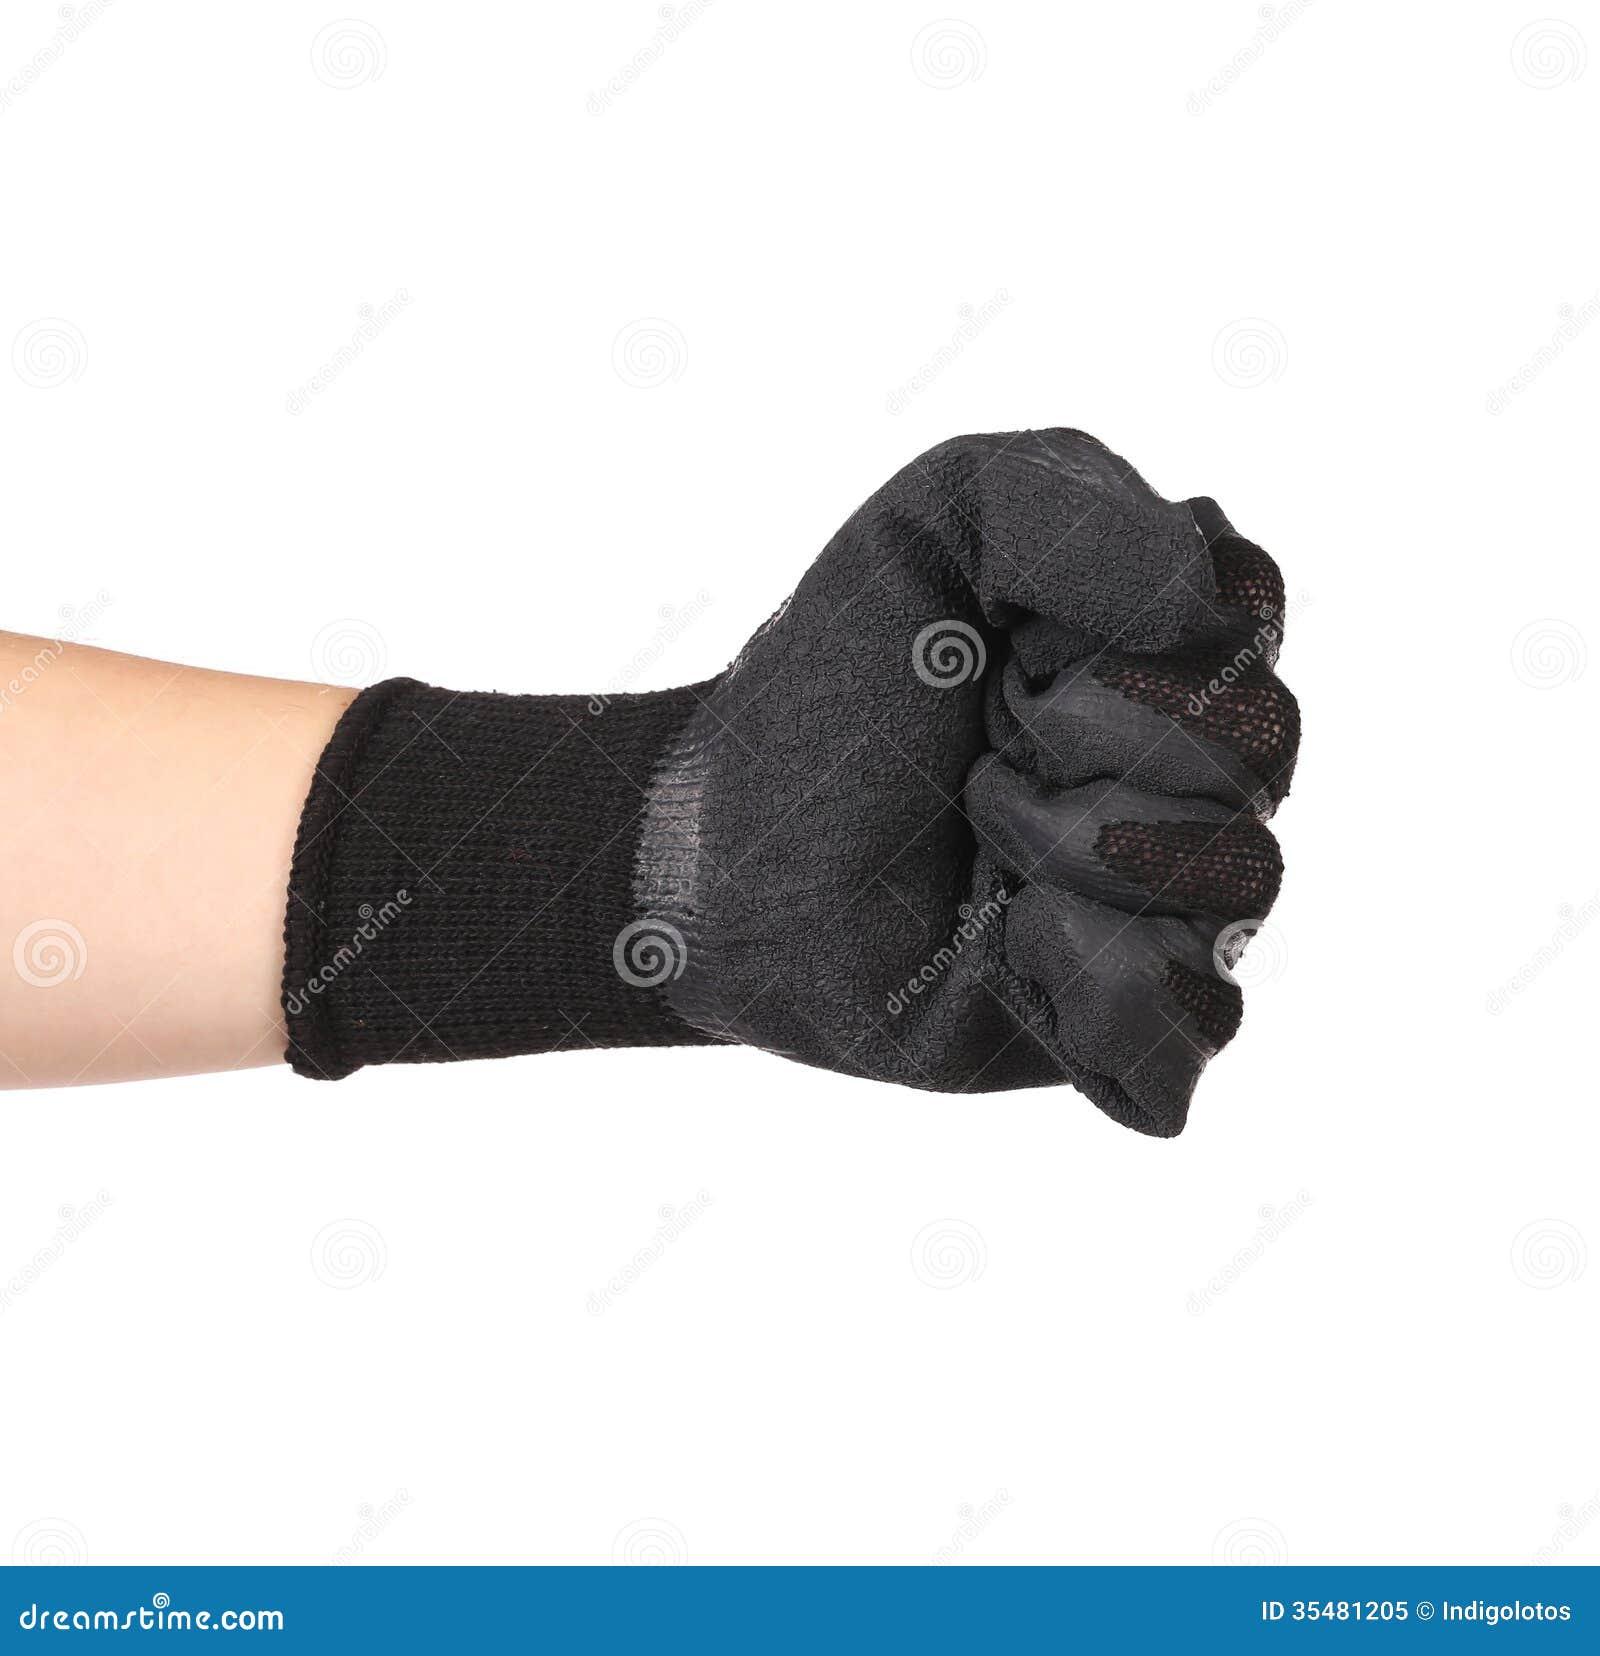 Fisting glove